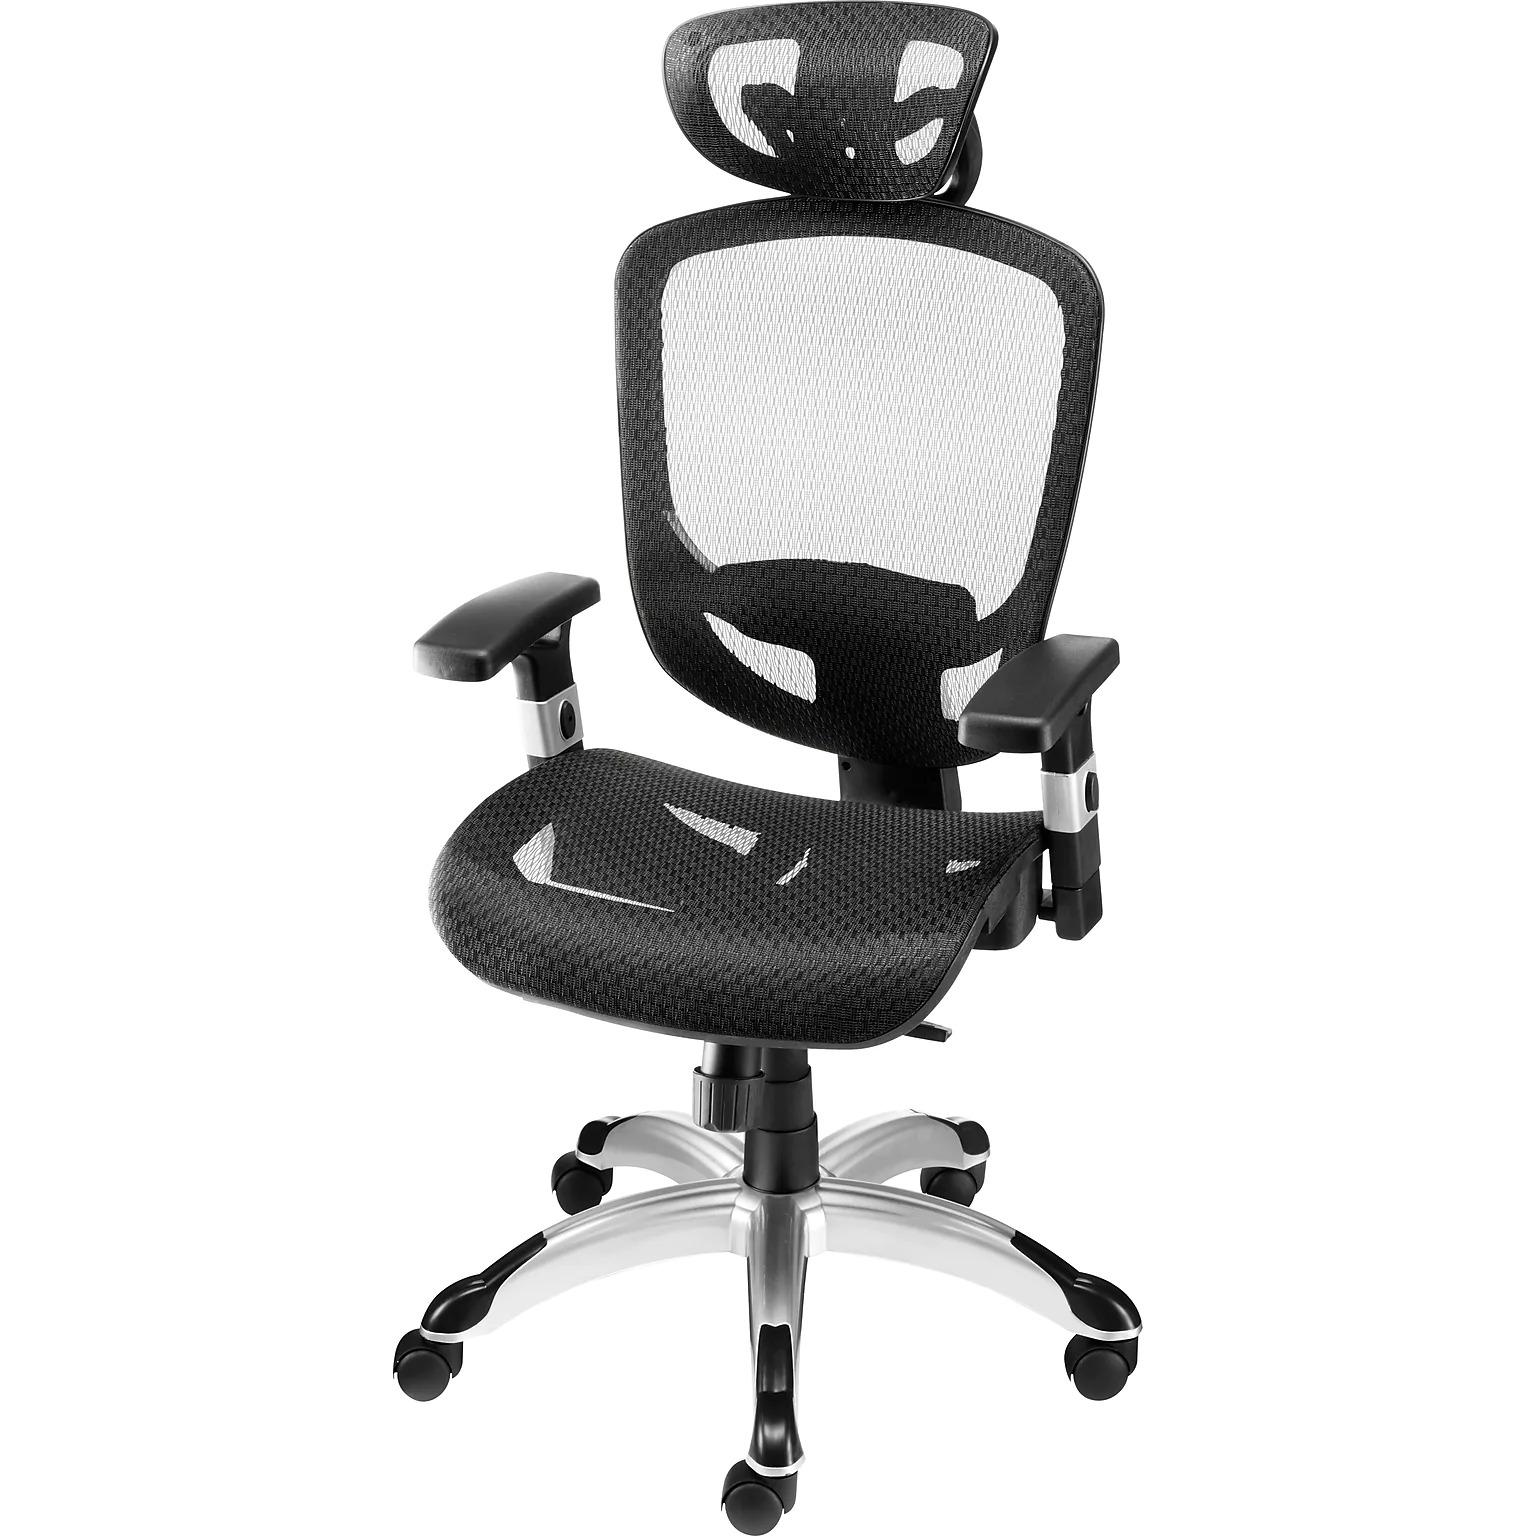 Staples FlexFit™ Hyken Mesh Task Chair + Free Shipping $159.99